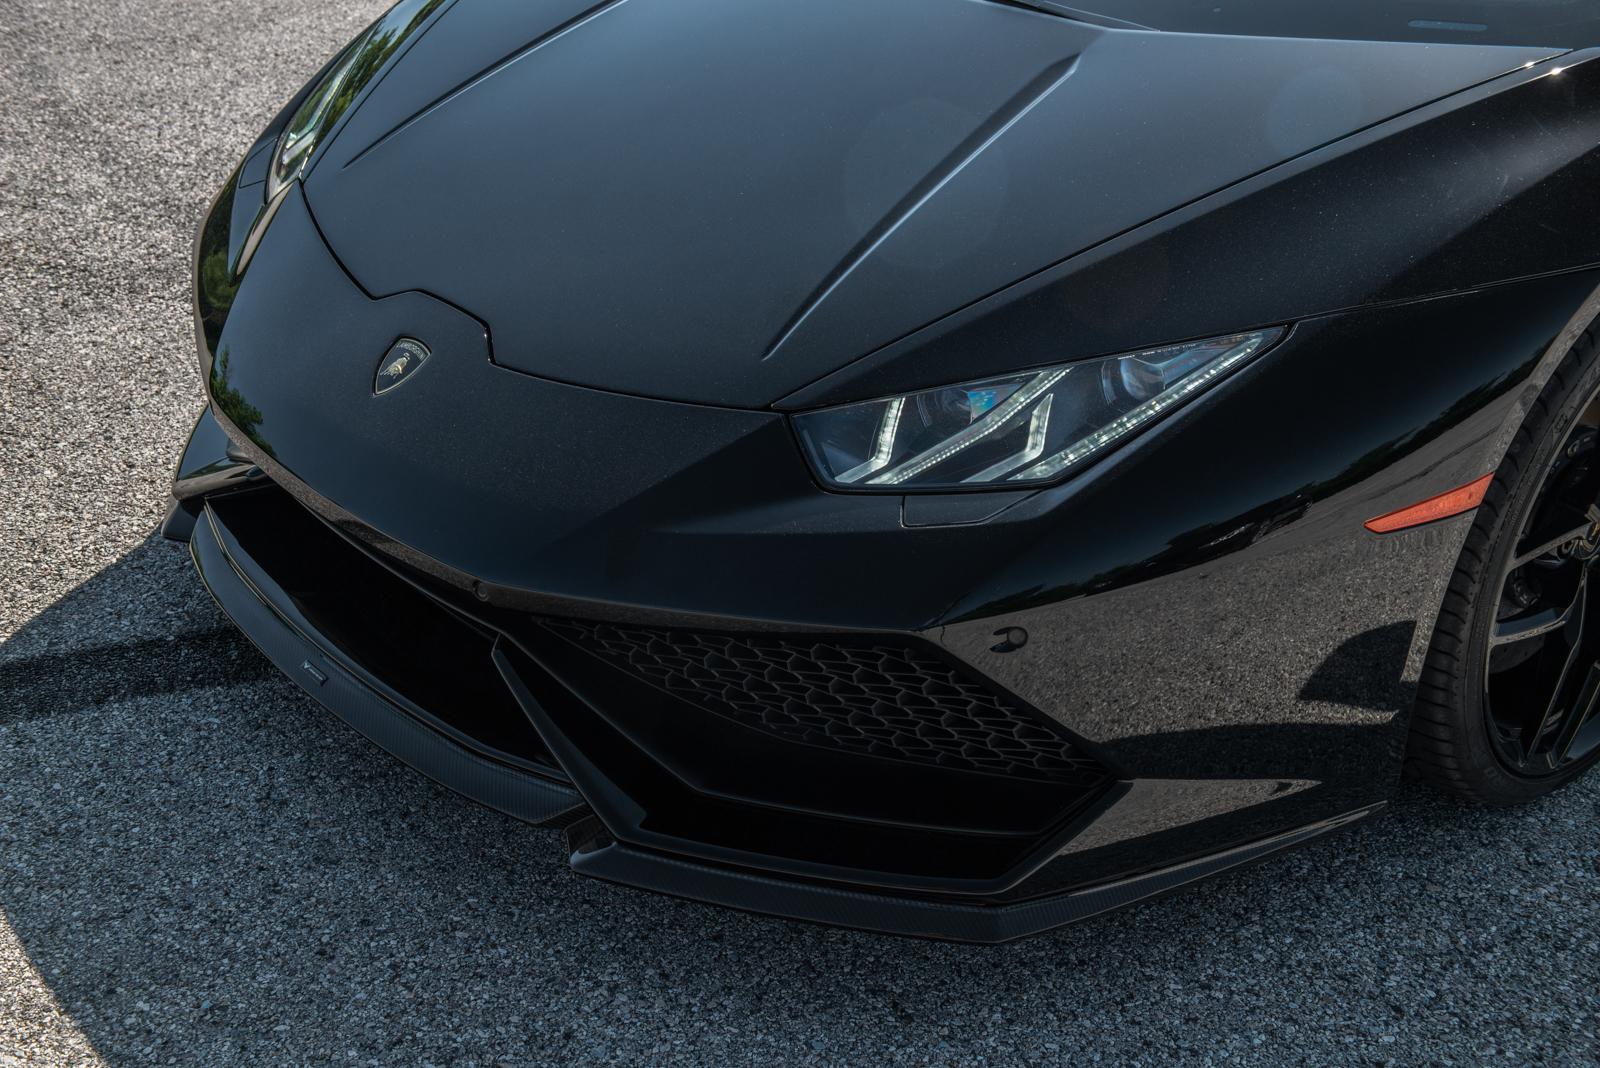 Vorsteiner Nero body kit for Lamborghini Huracan Verona new model